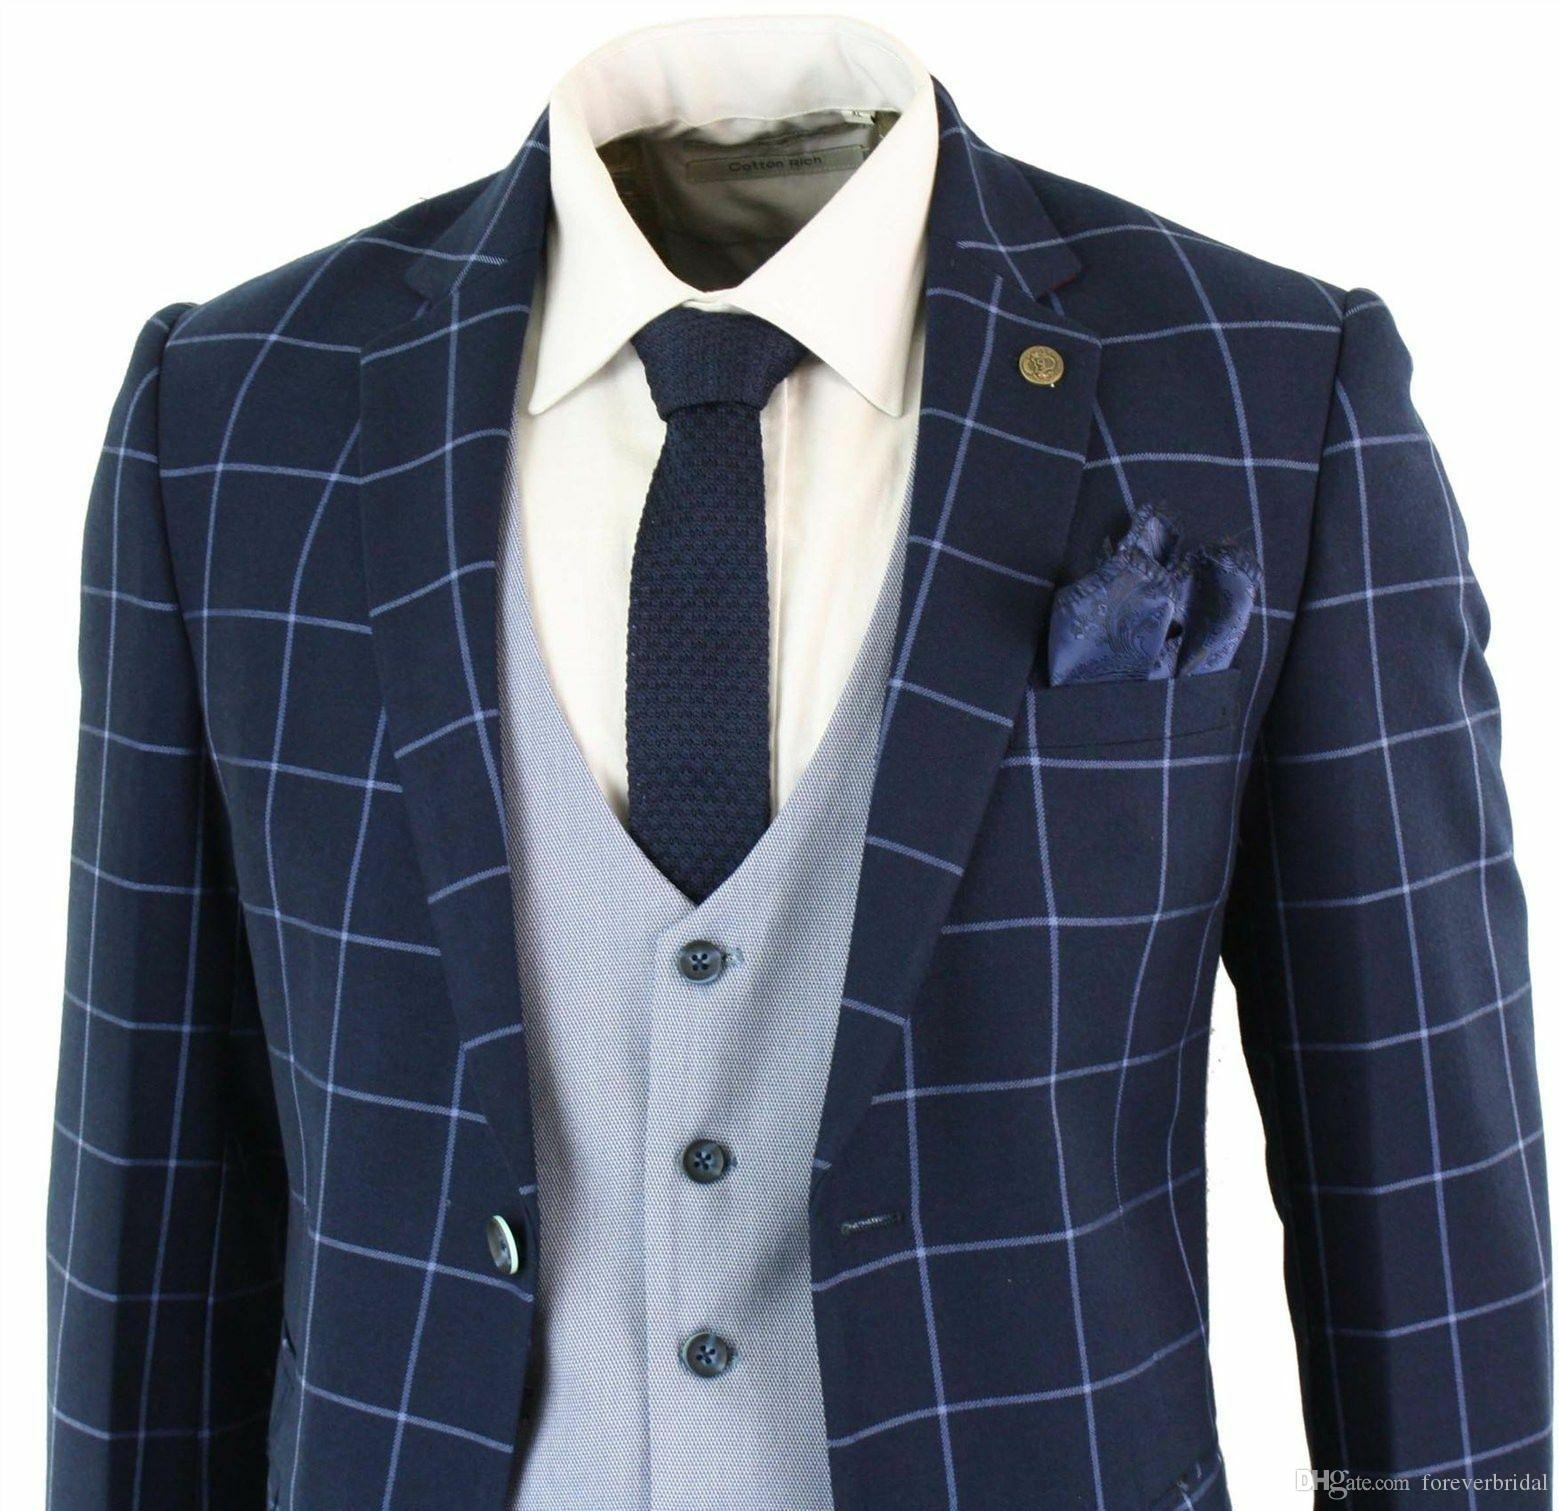 Classical Mens 3 Pieces Navy Blue Check Tailored Peak Lapel Tuxedo Elegant Pocket Slim Fit Suit